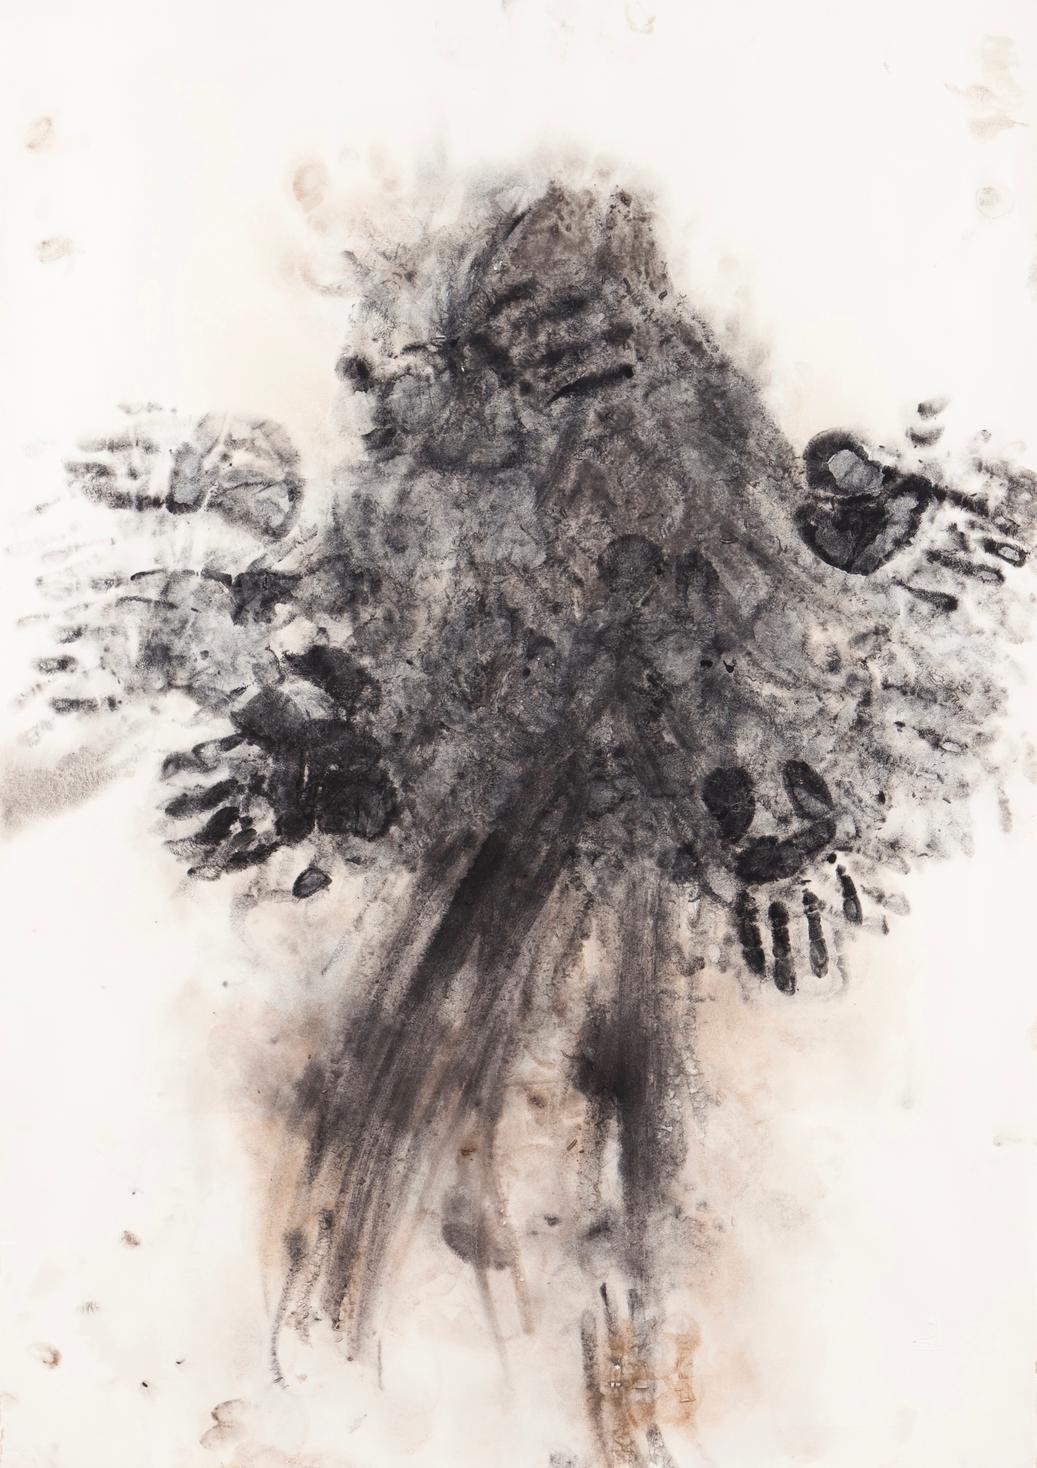 Francisco Tropa-Untitled-2005